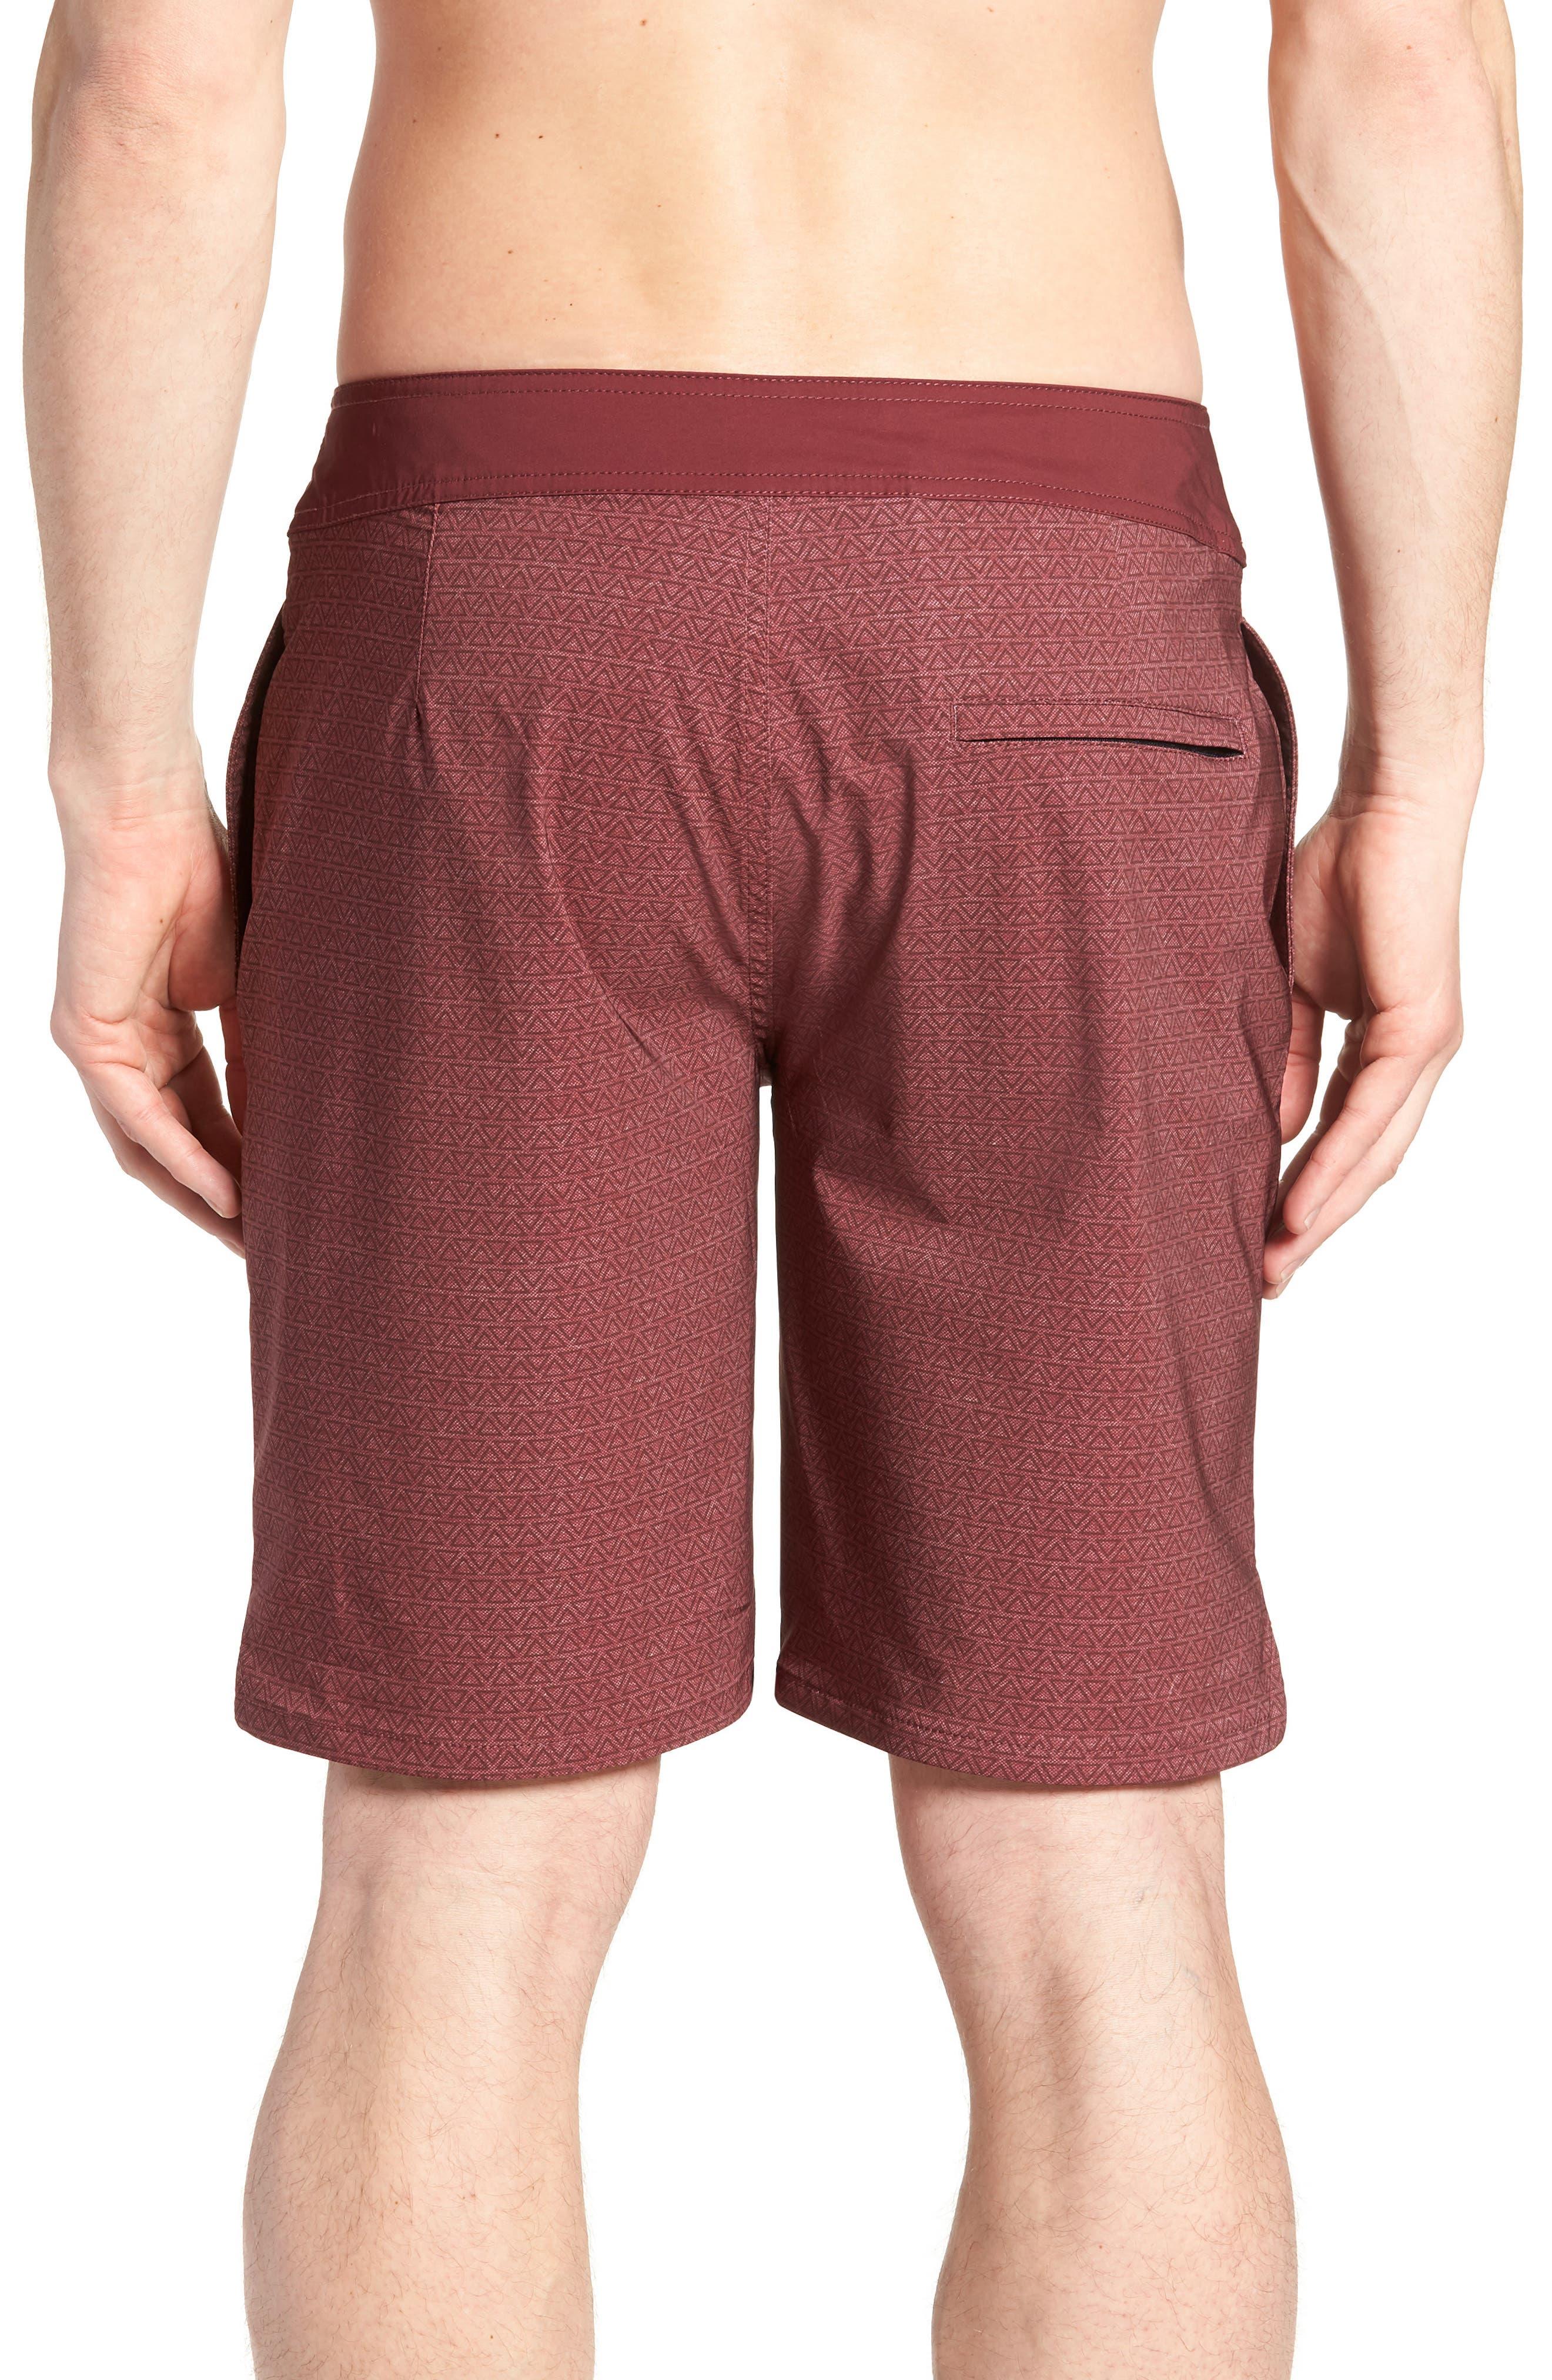 Blanders Regular Fit Board Shorts,                             Alternate thumbnail 2, color,                             Oxblood